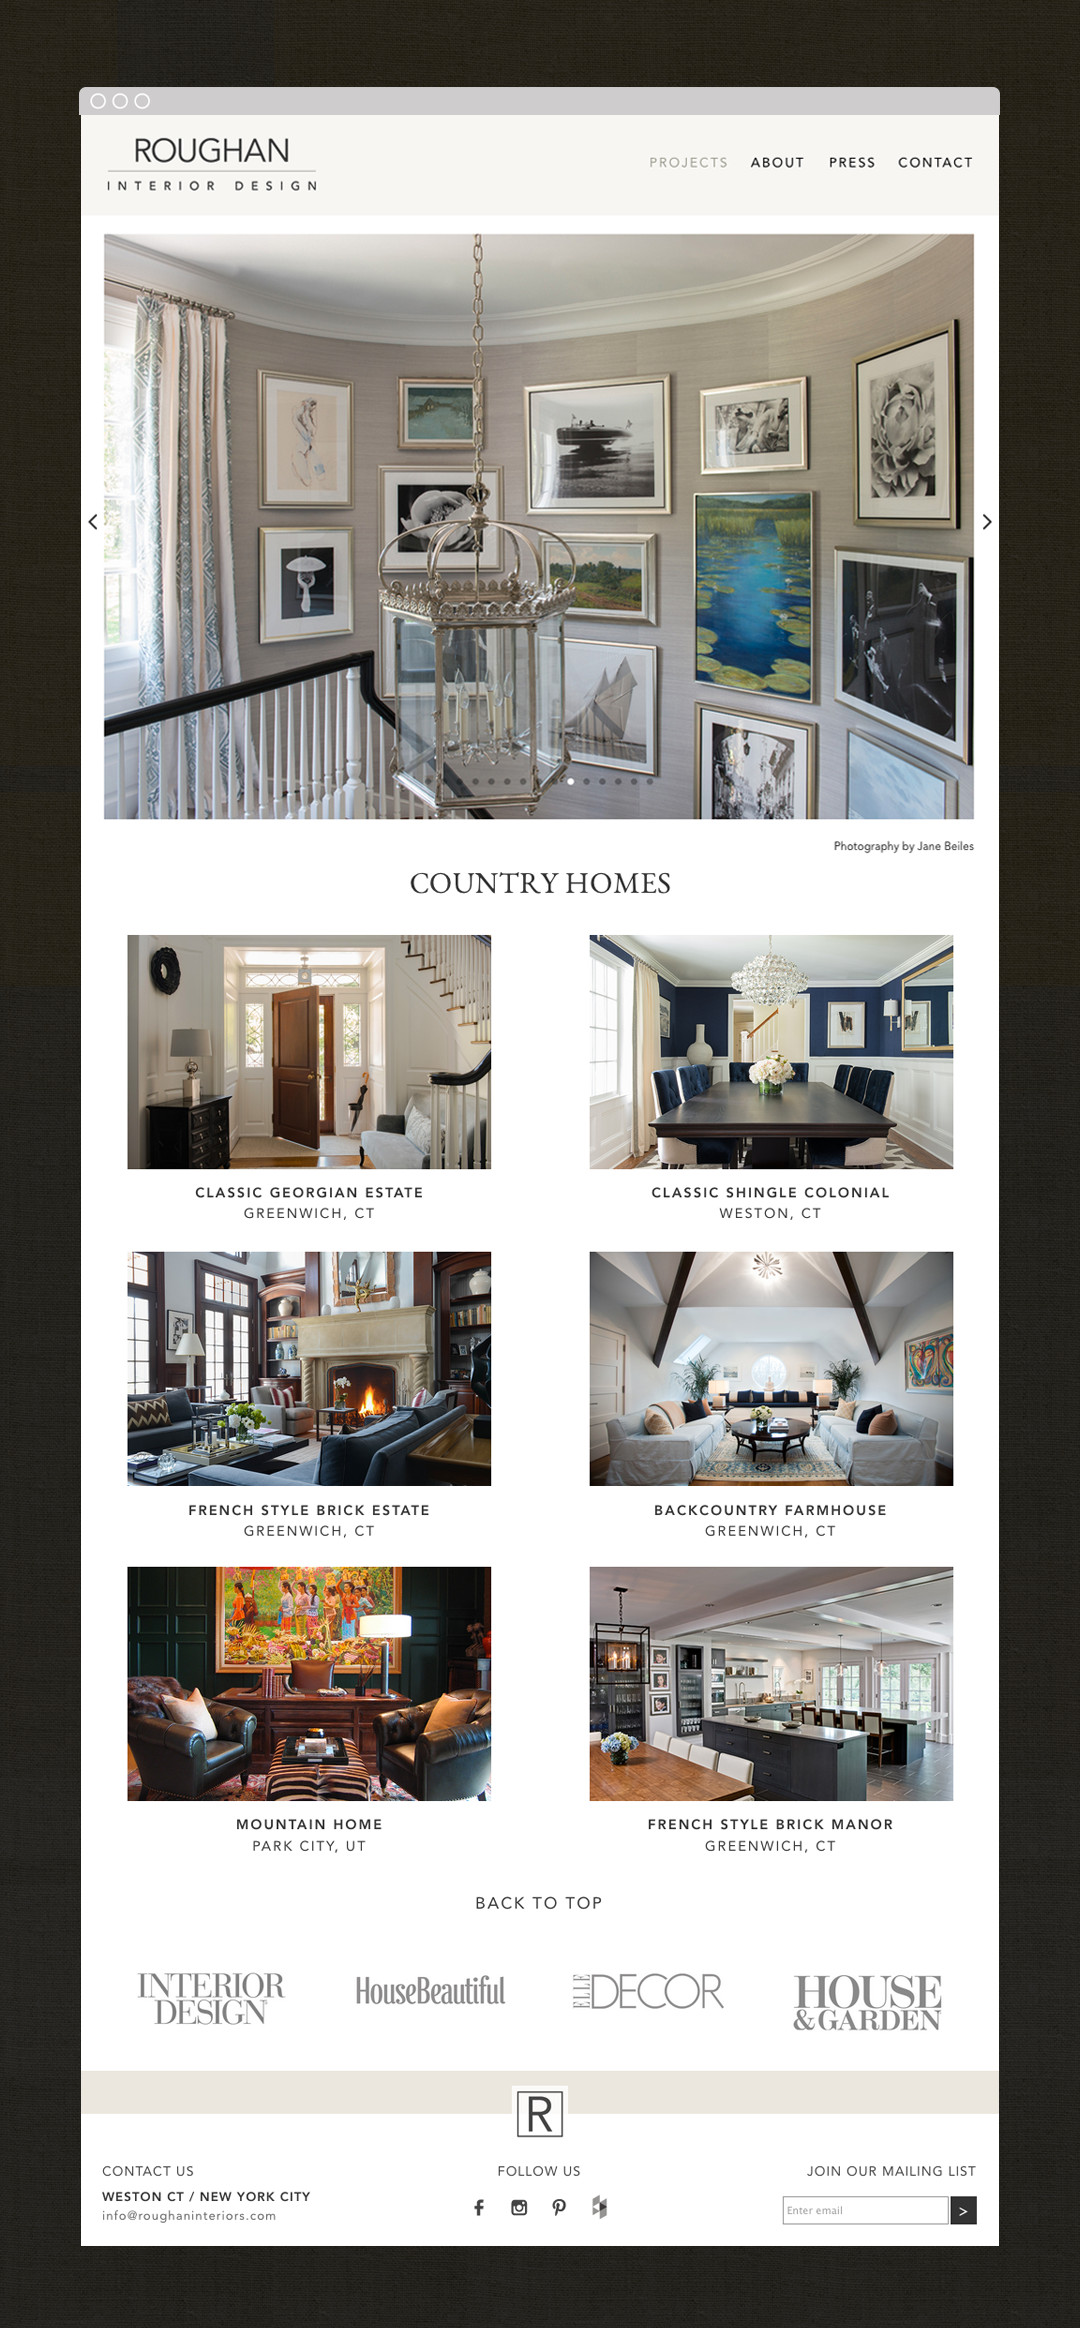 roughan-interiors-sheila-buchanan-9.jpg